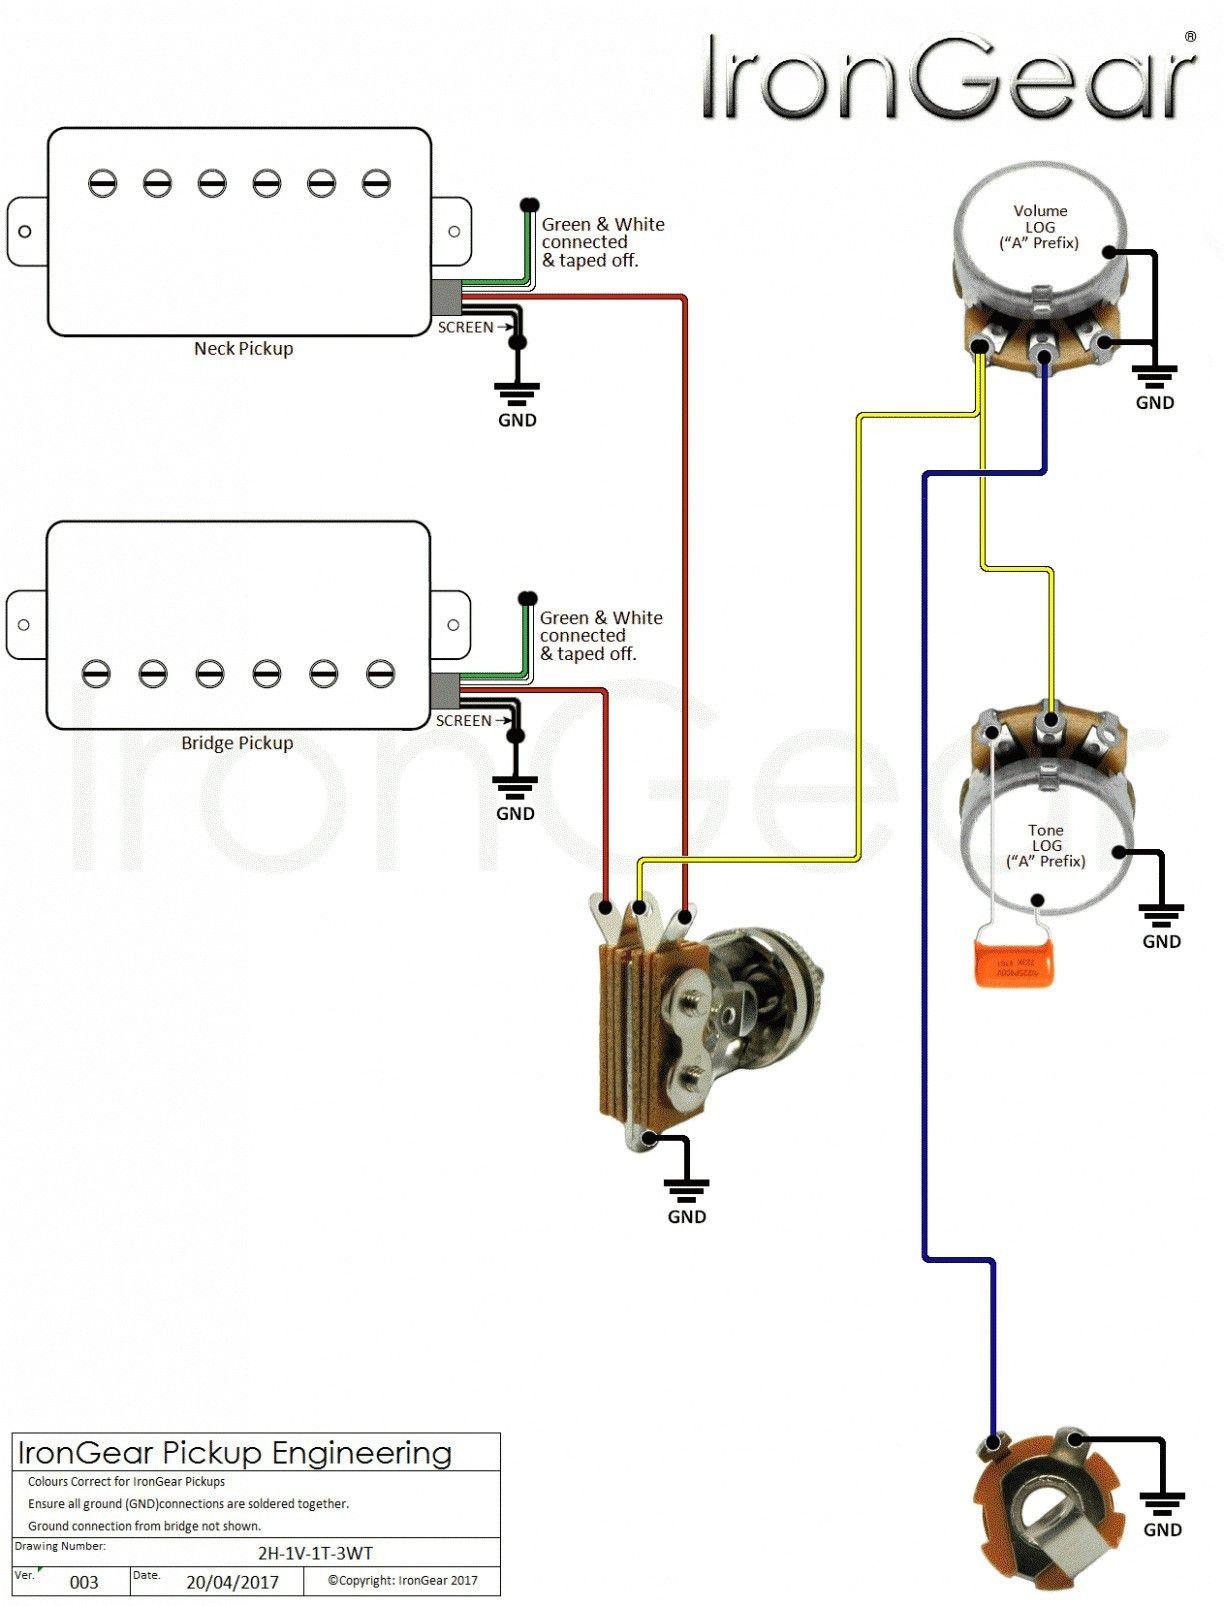 gibson paul standard wiring diagram unique gibson sg guitar wiring diagram save wiring diagram for gibson [ 1224 x 1606 Pixel ]